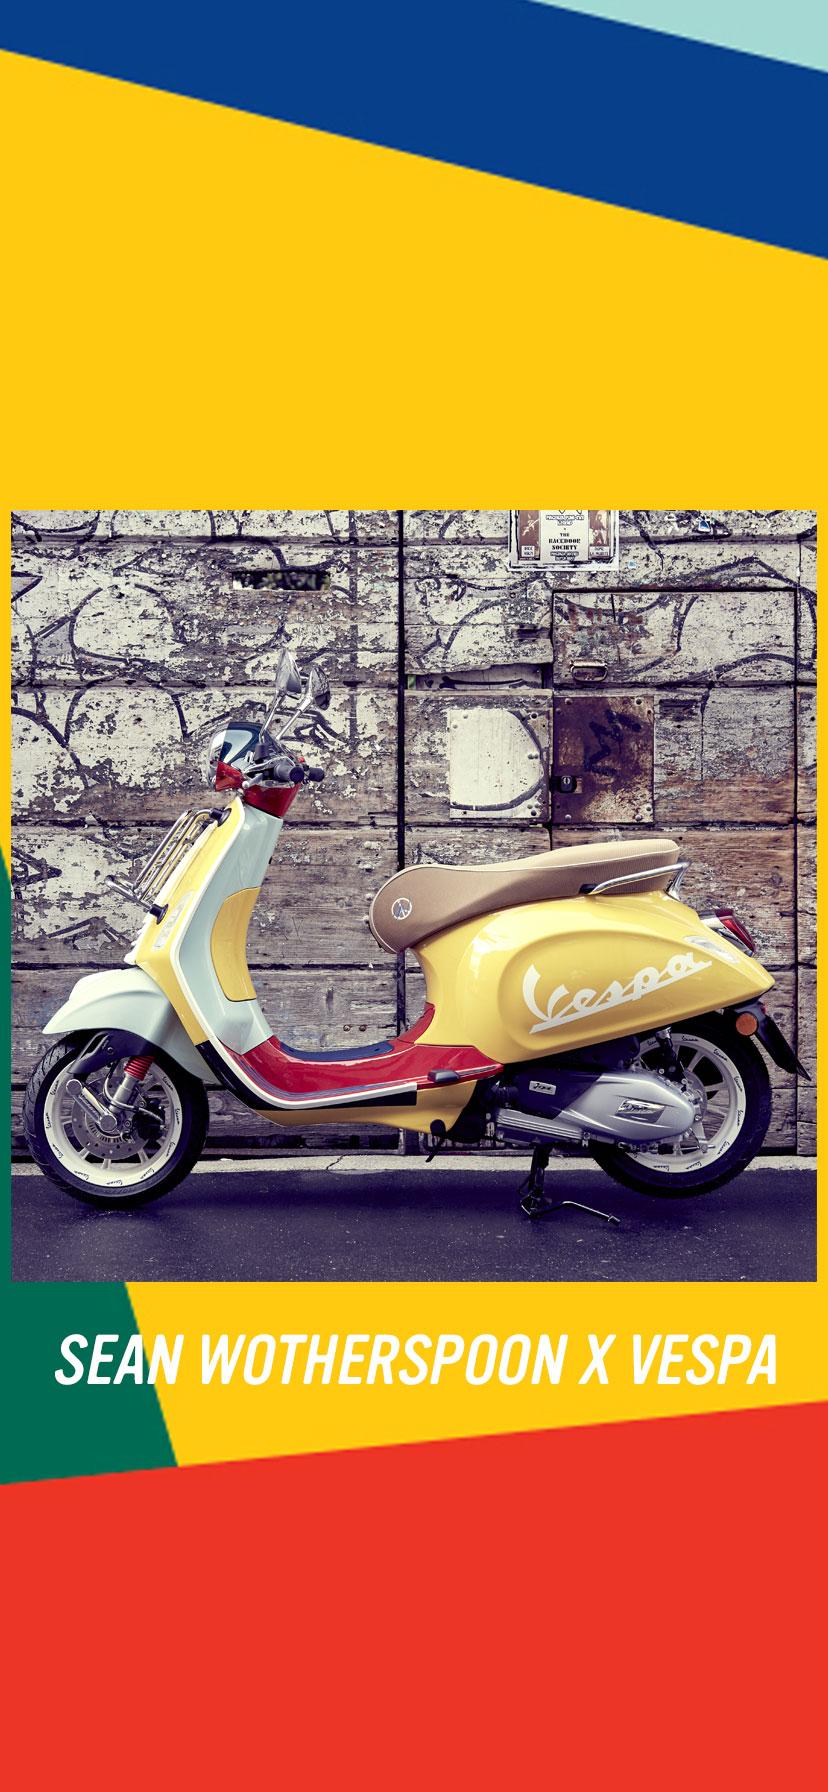 Sean Wotherspoon X Vespa Primavera scooter